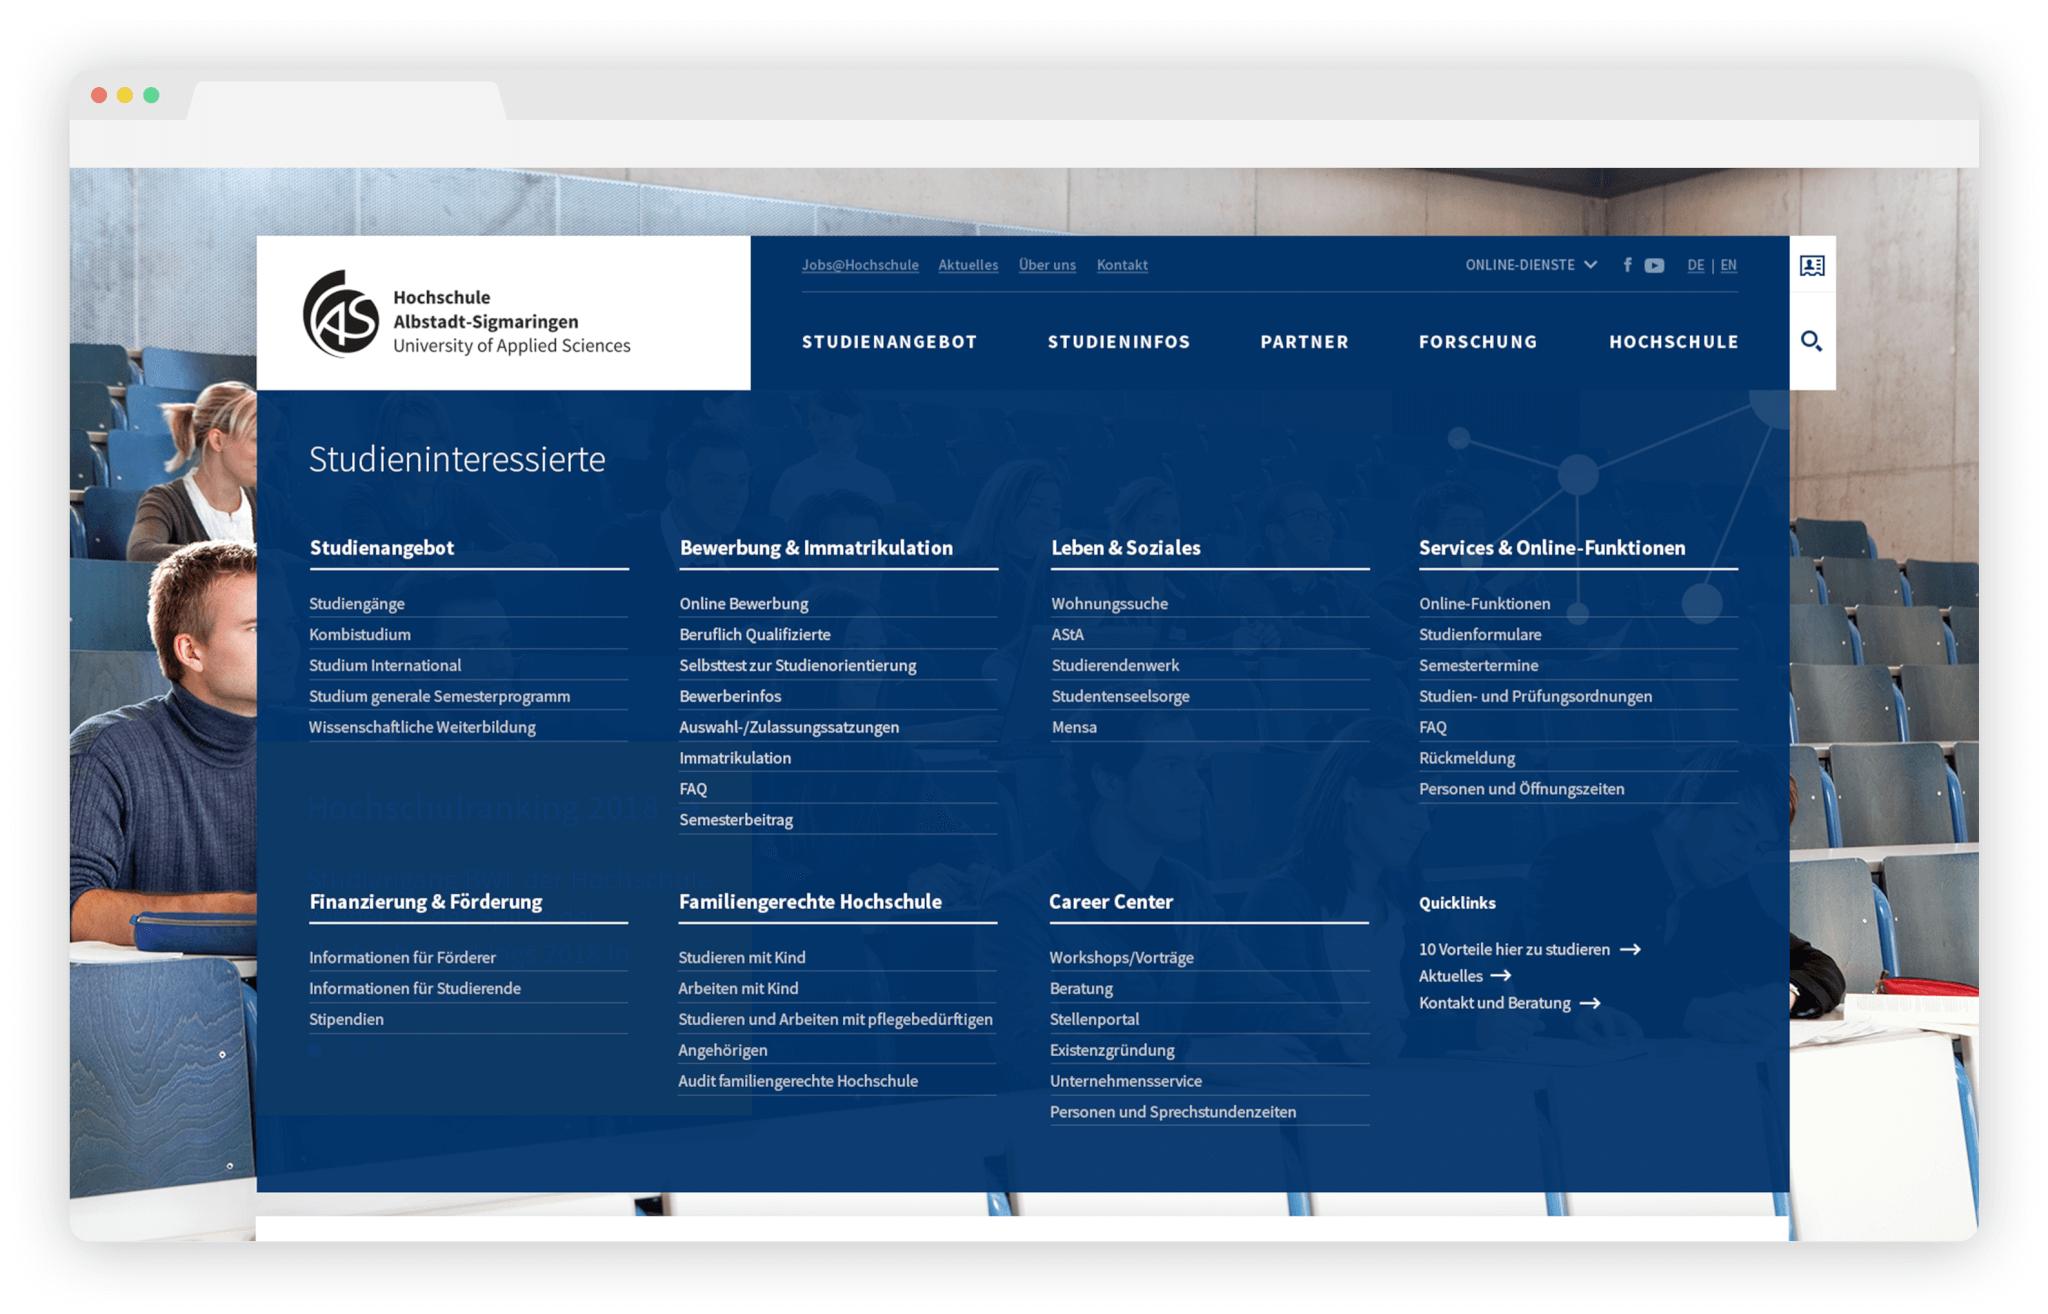 Website-Relaunch Hochschule: Mega-Menü